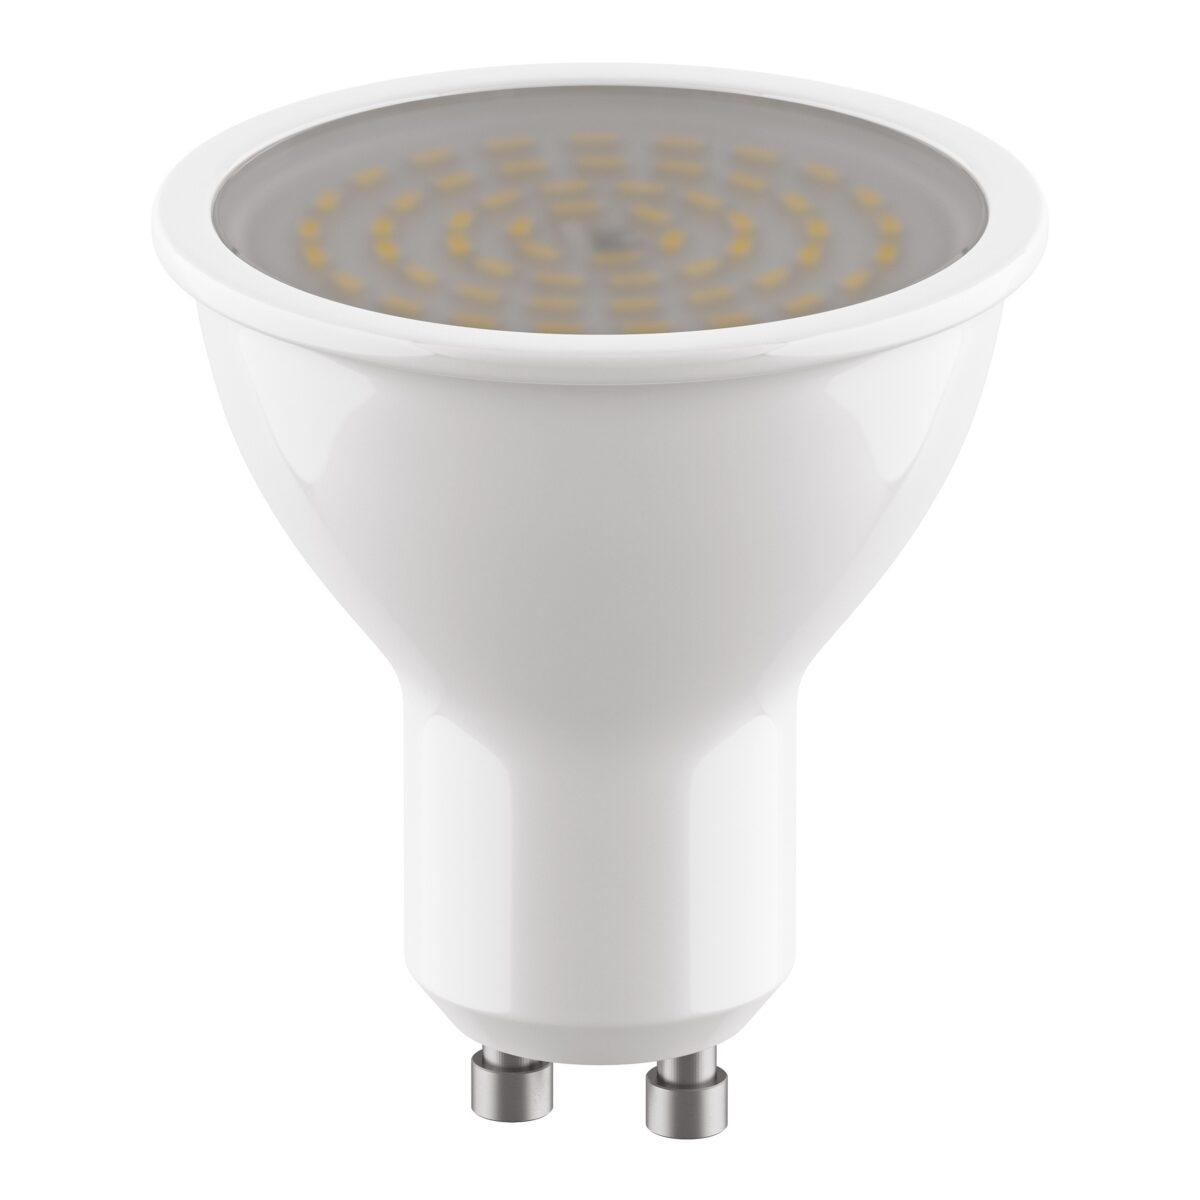 940264 ЛАМПА LED 220V HP16 GU10 6.5W=60W 325LM 120G FR 4000K 20000H (в комплекте)